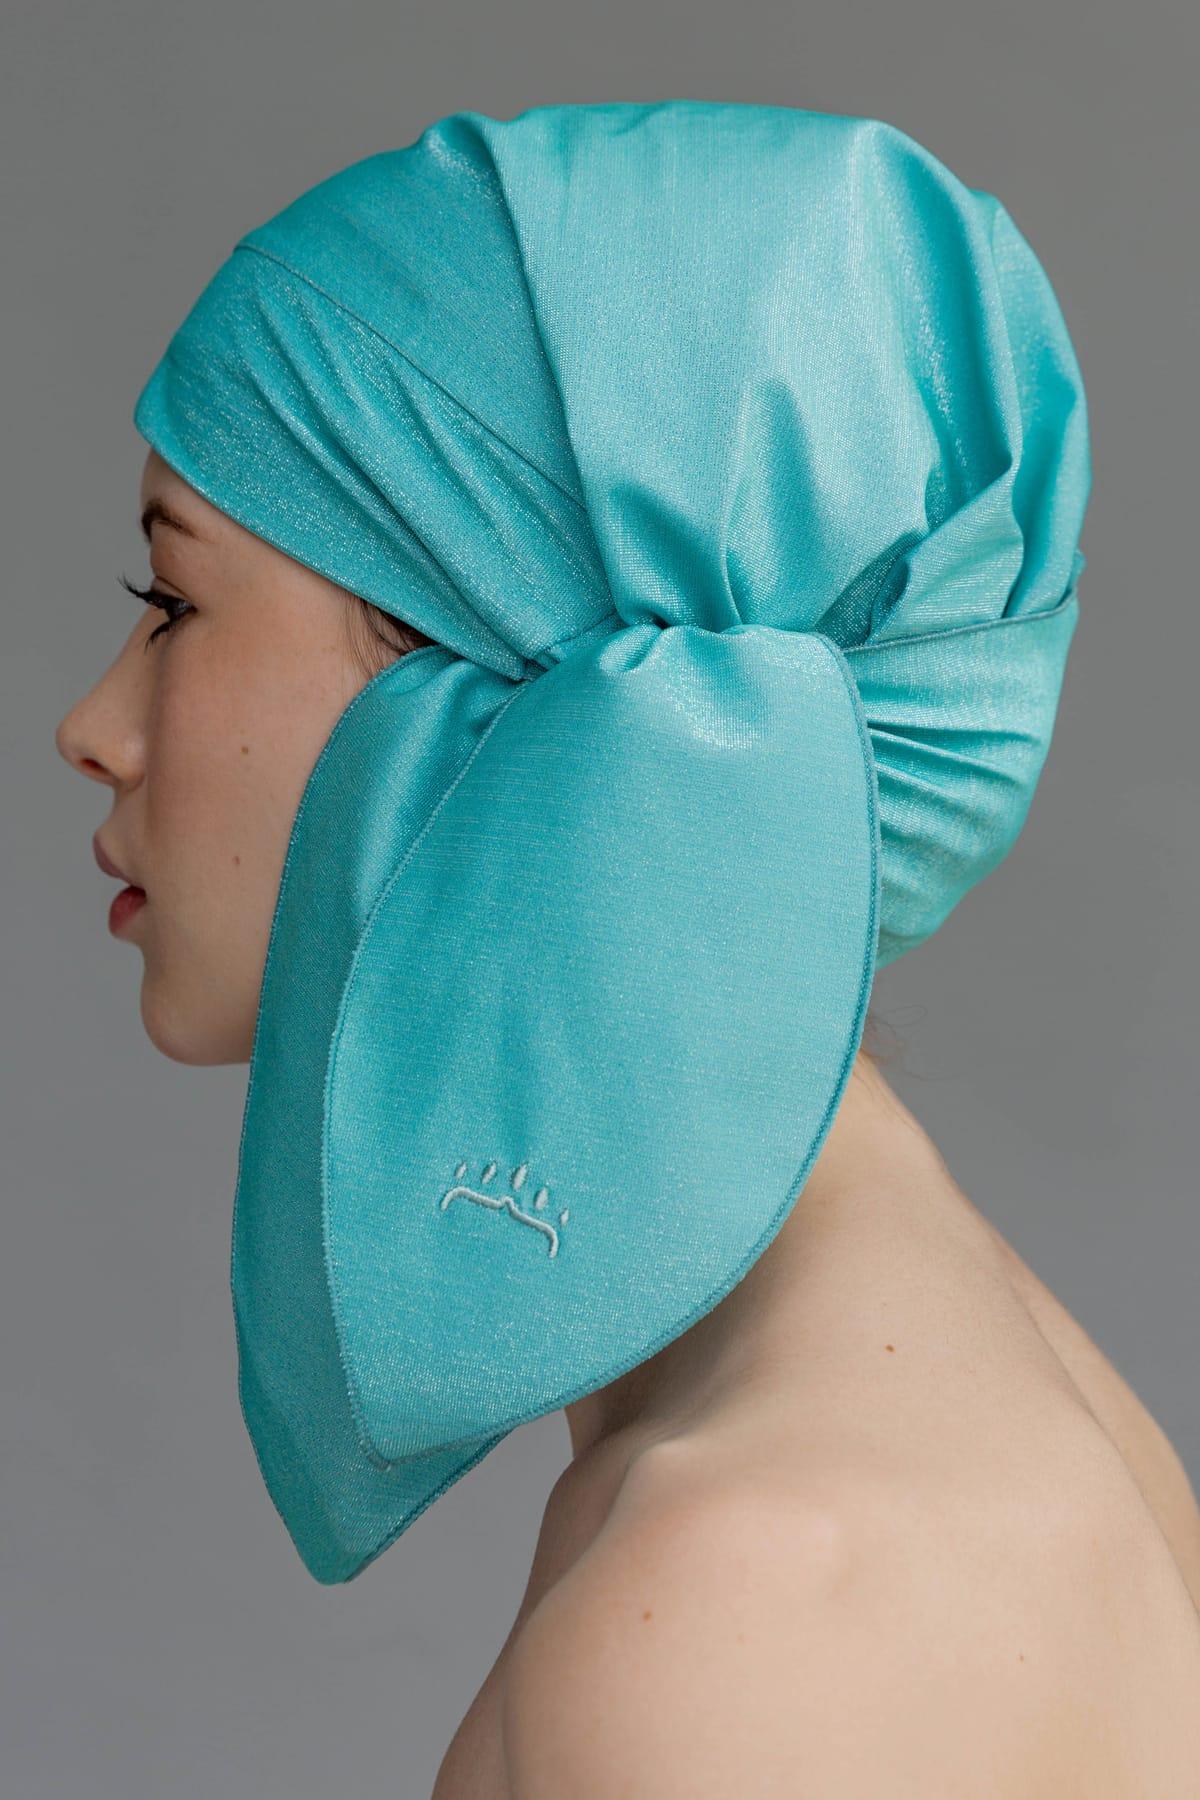 Gorro de ducha color turquesa